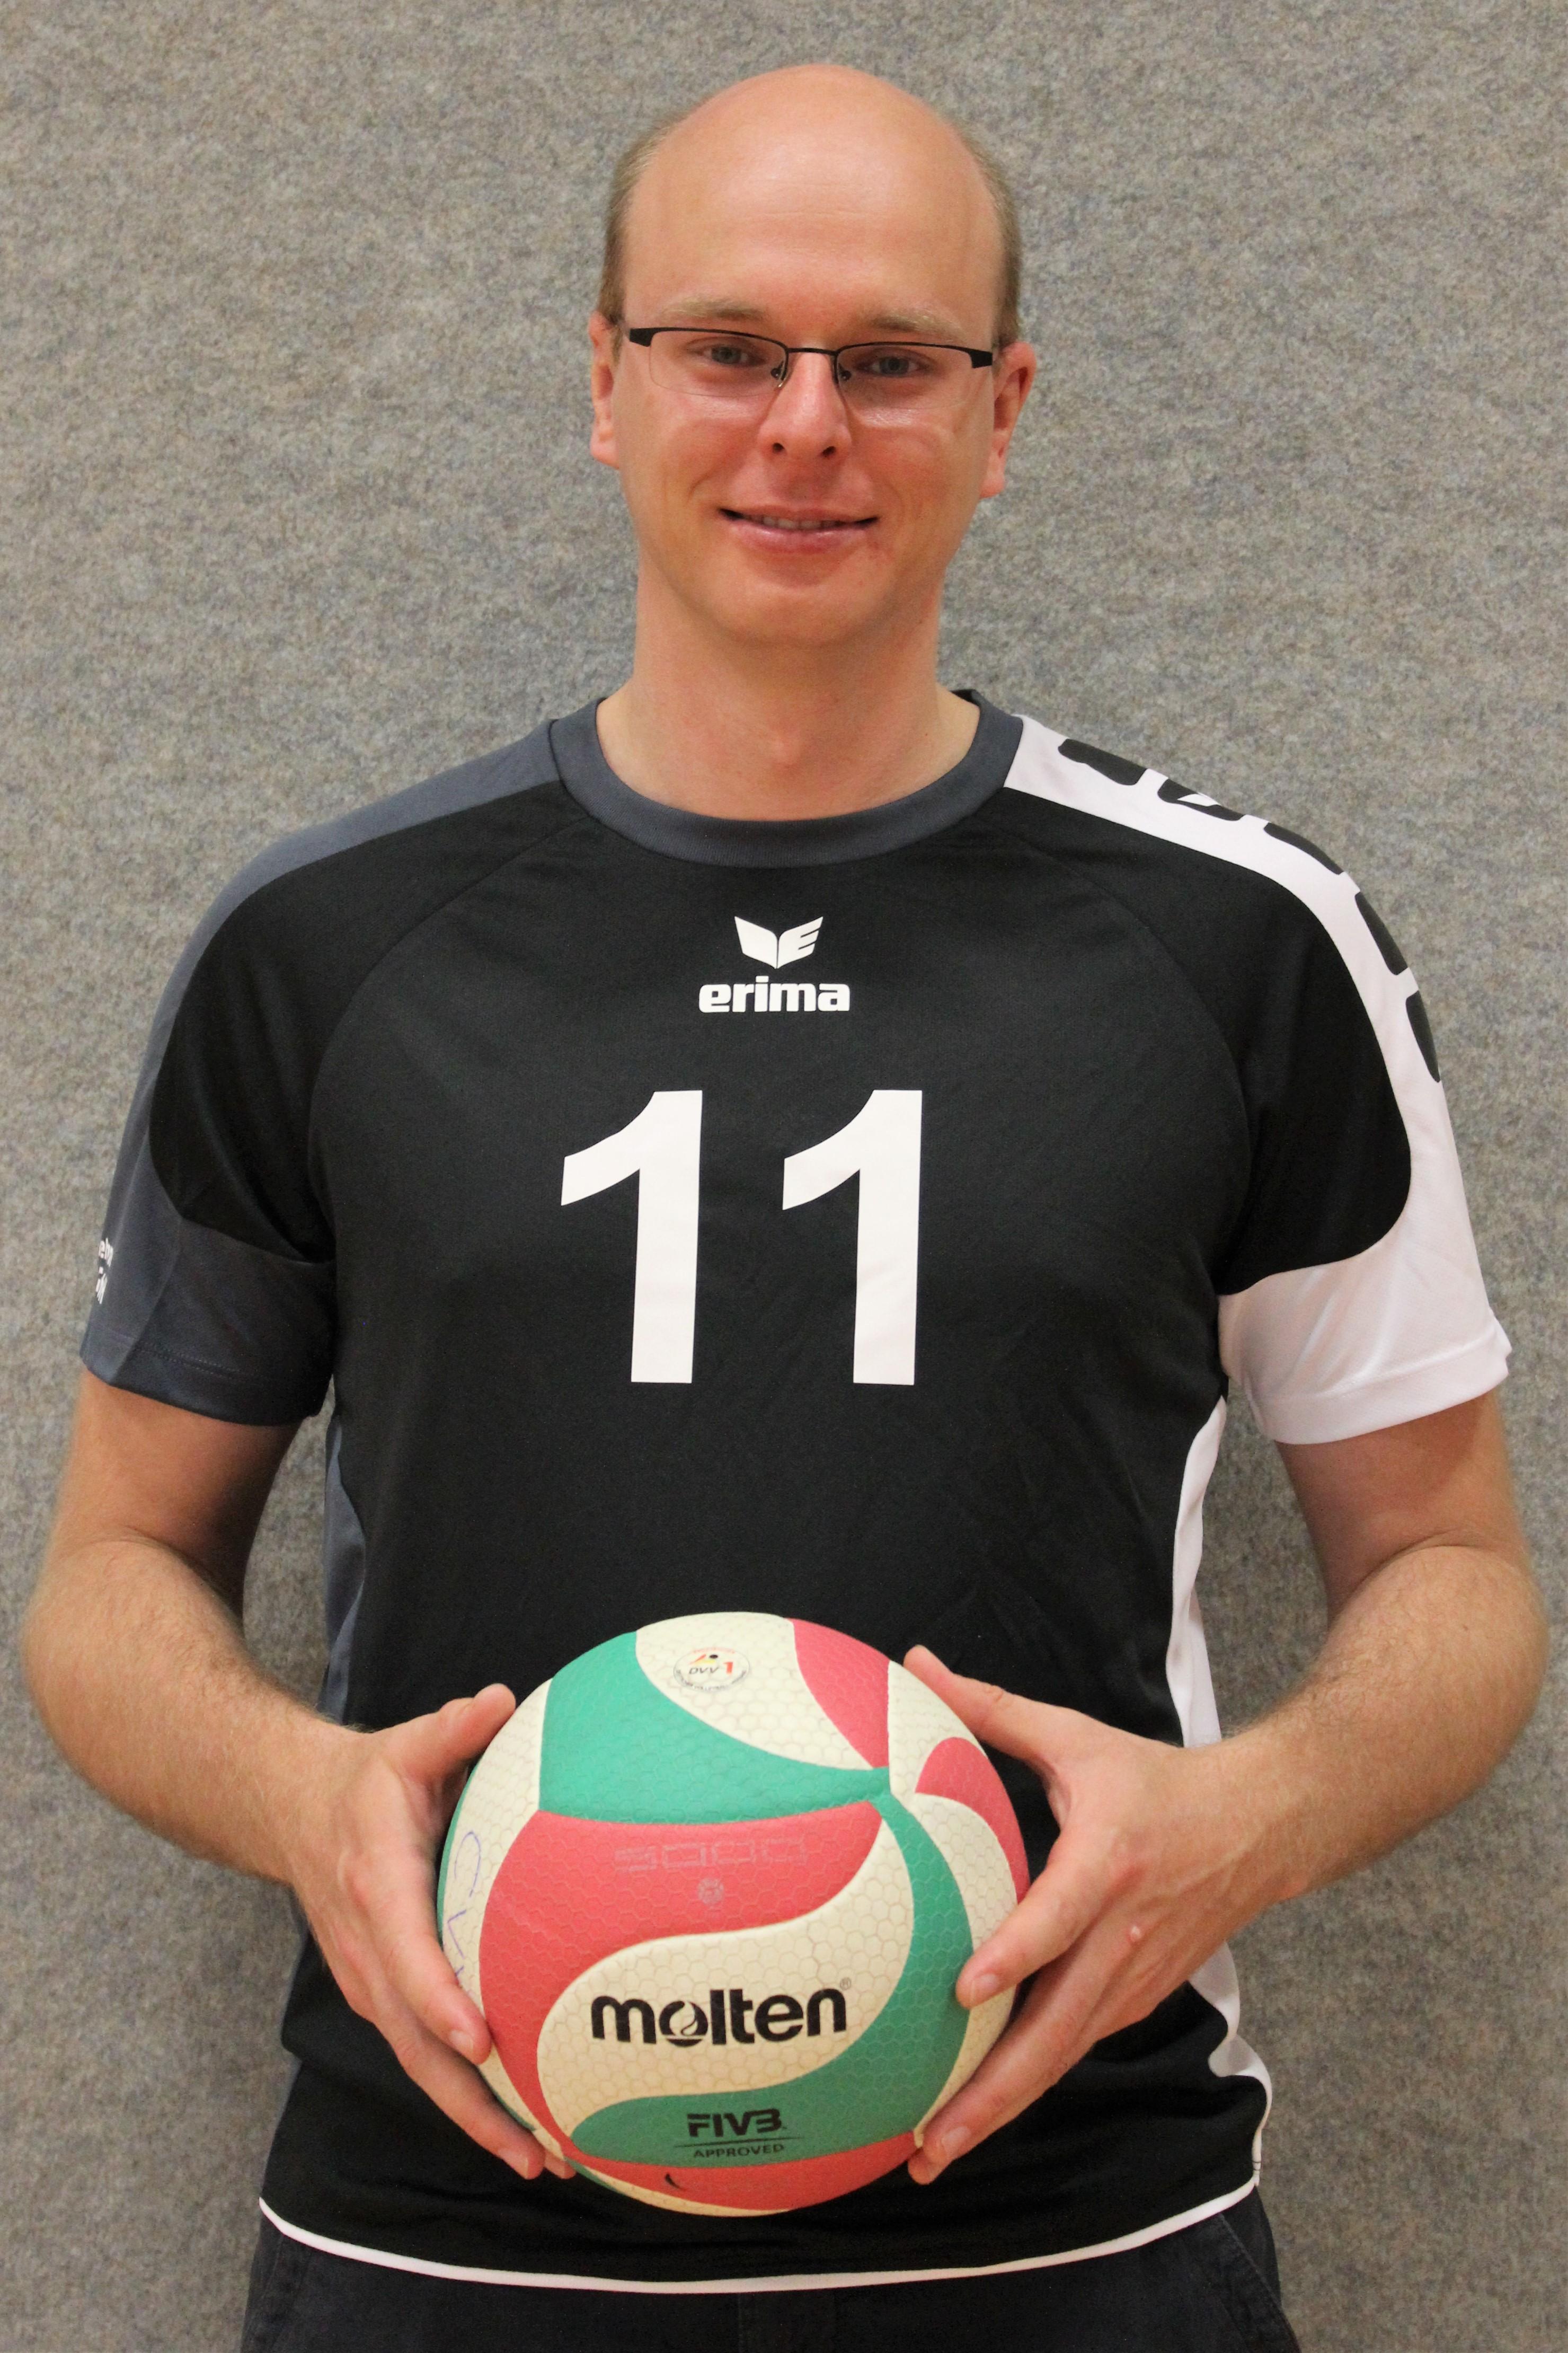 Toni Bodenbinder Trinkotnmmer: 11 Position: Mittelblock Größe: